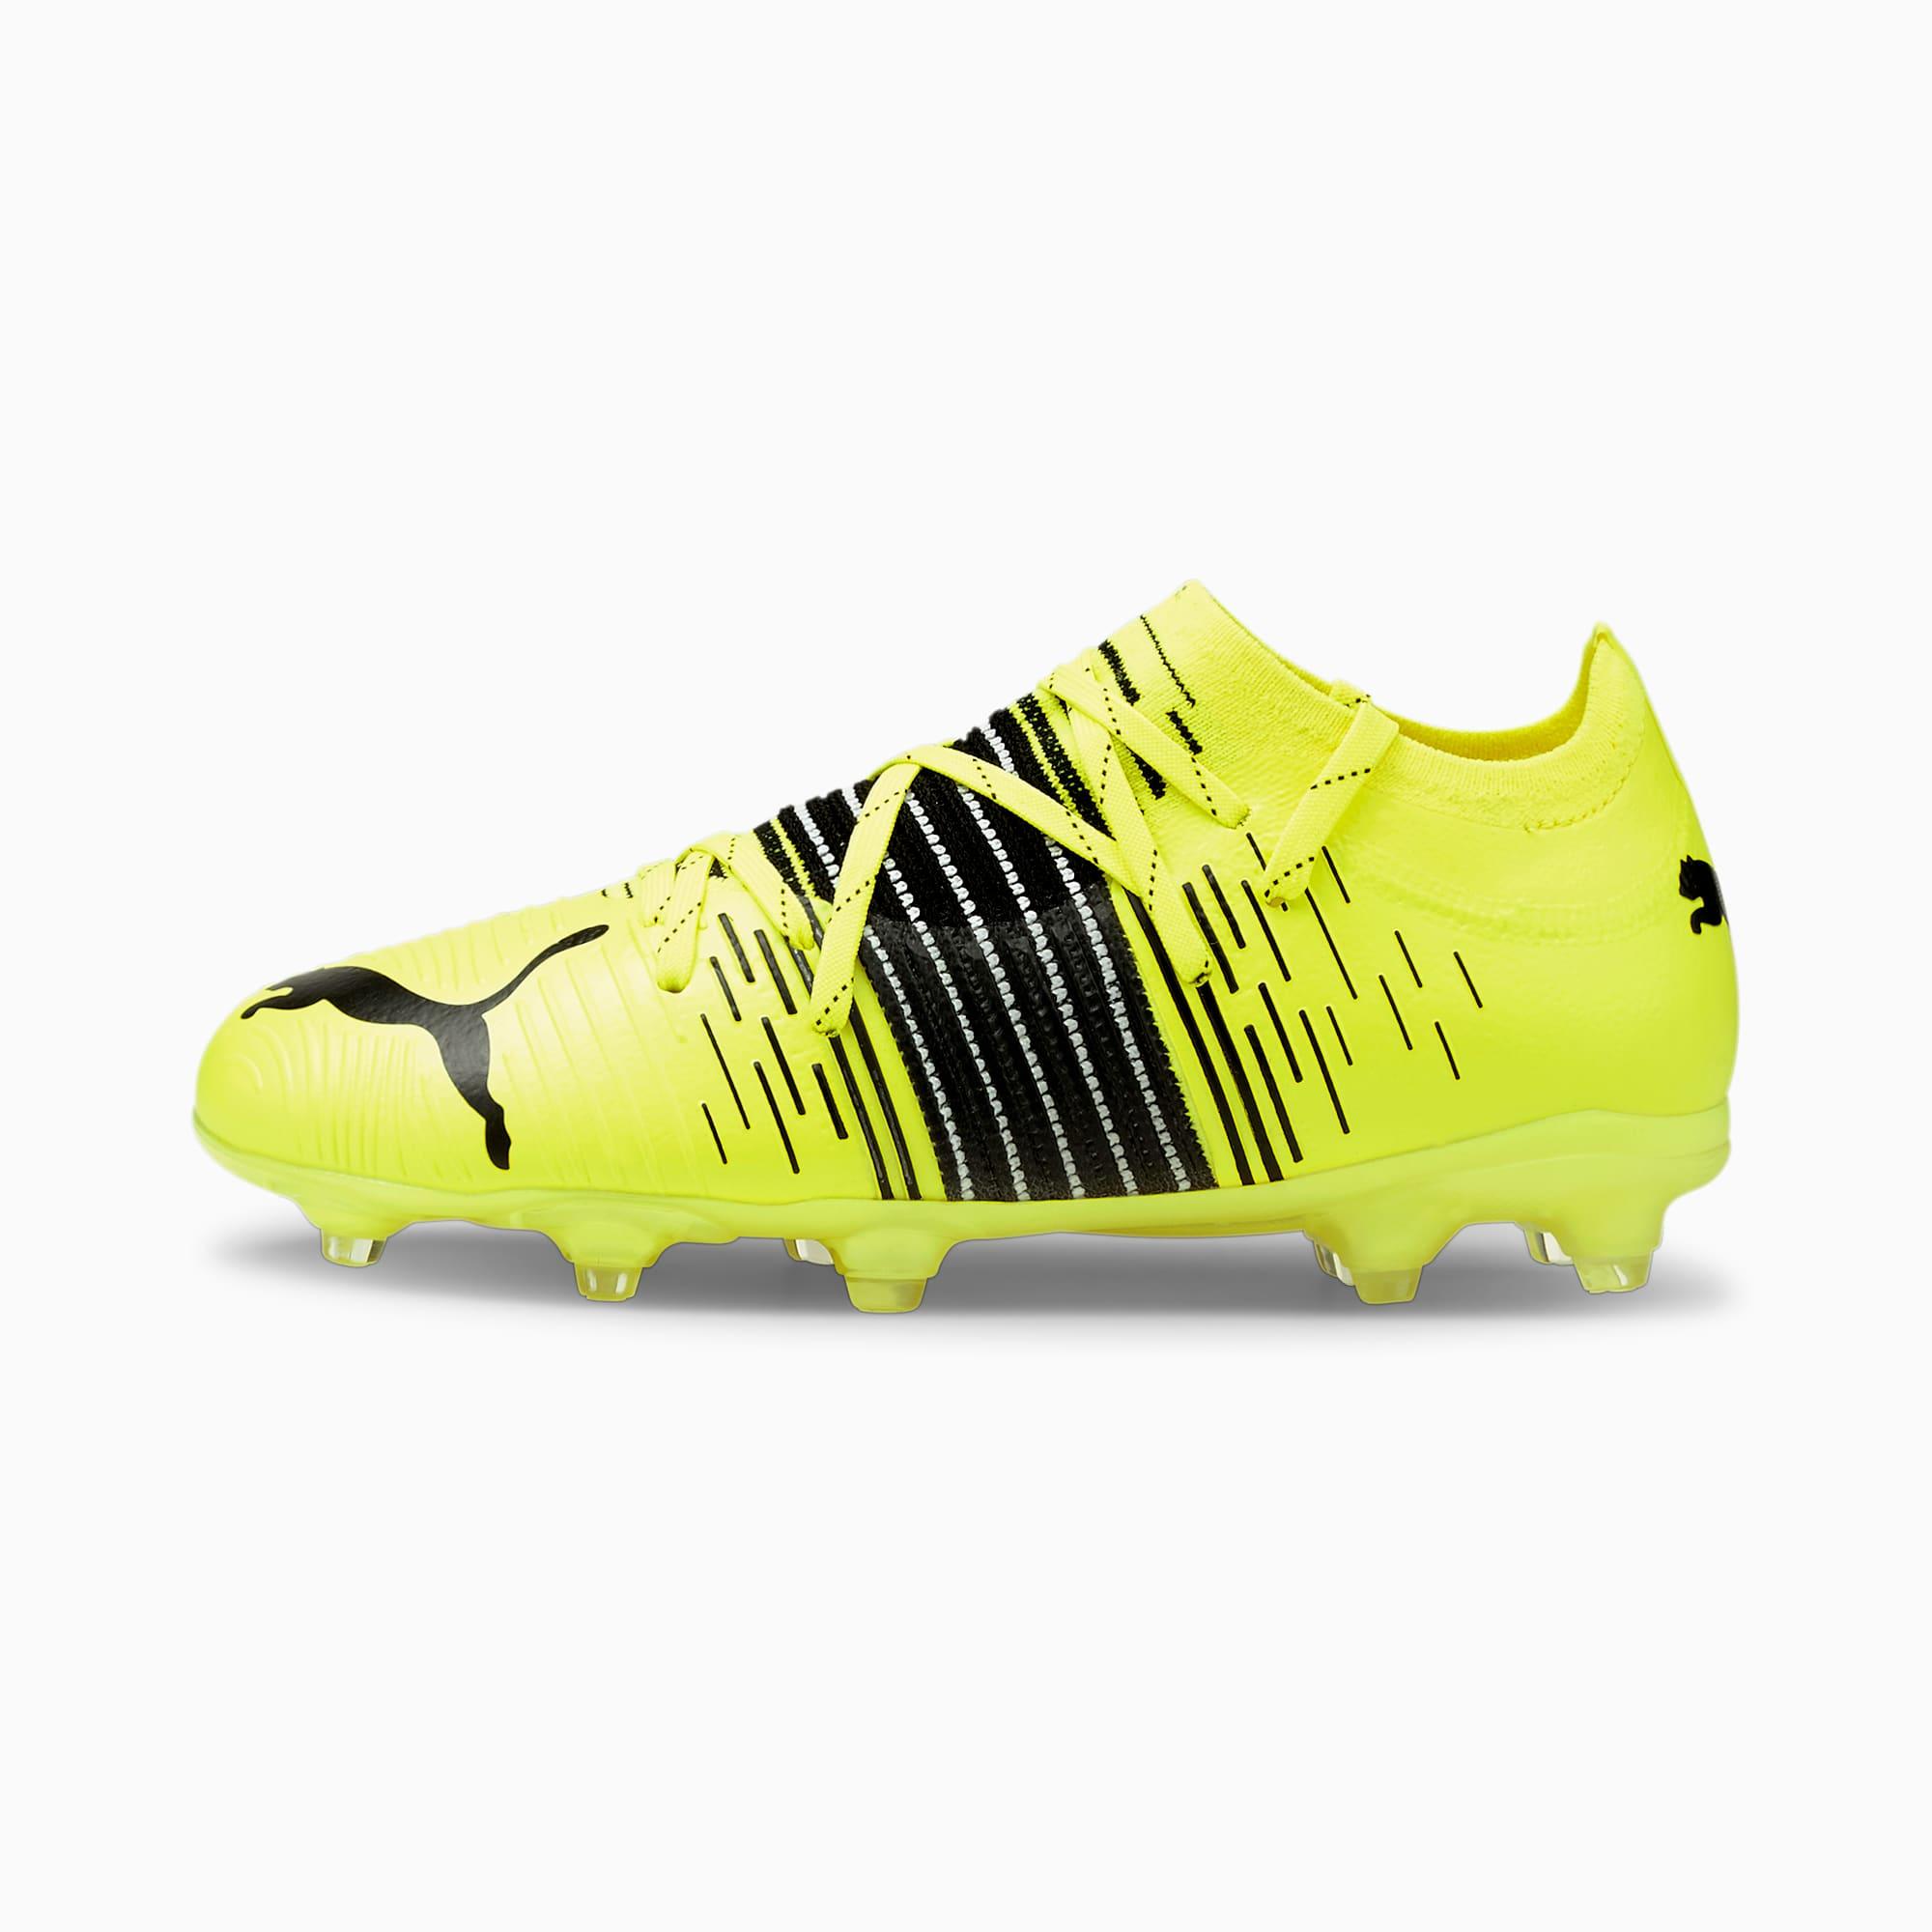 FUTURE Z 2.1 FG/AG Soccer Cleats JR